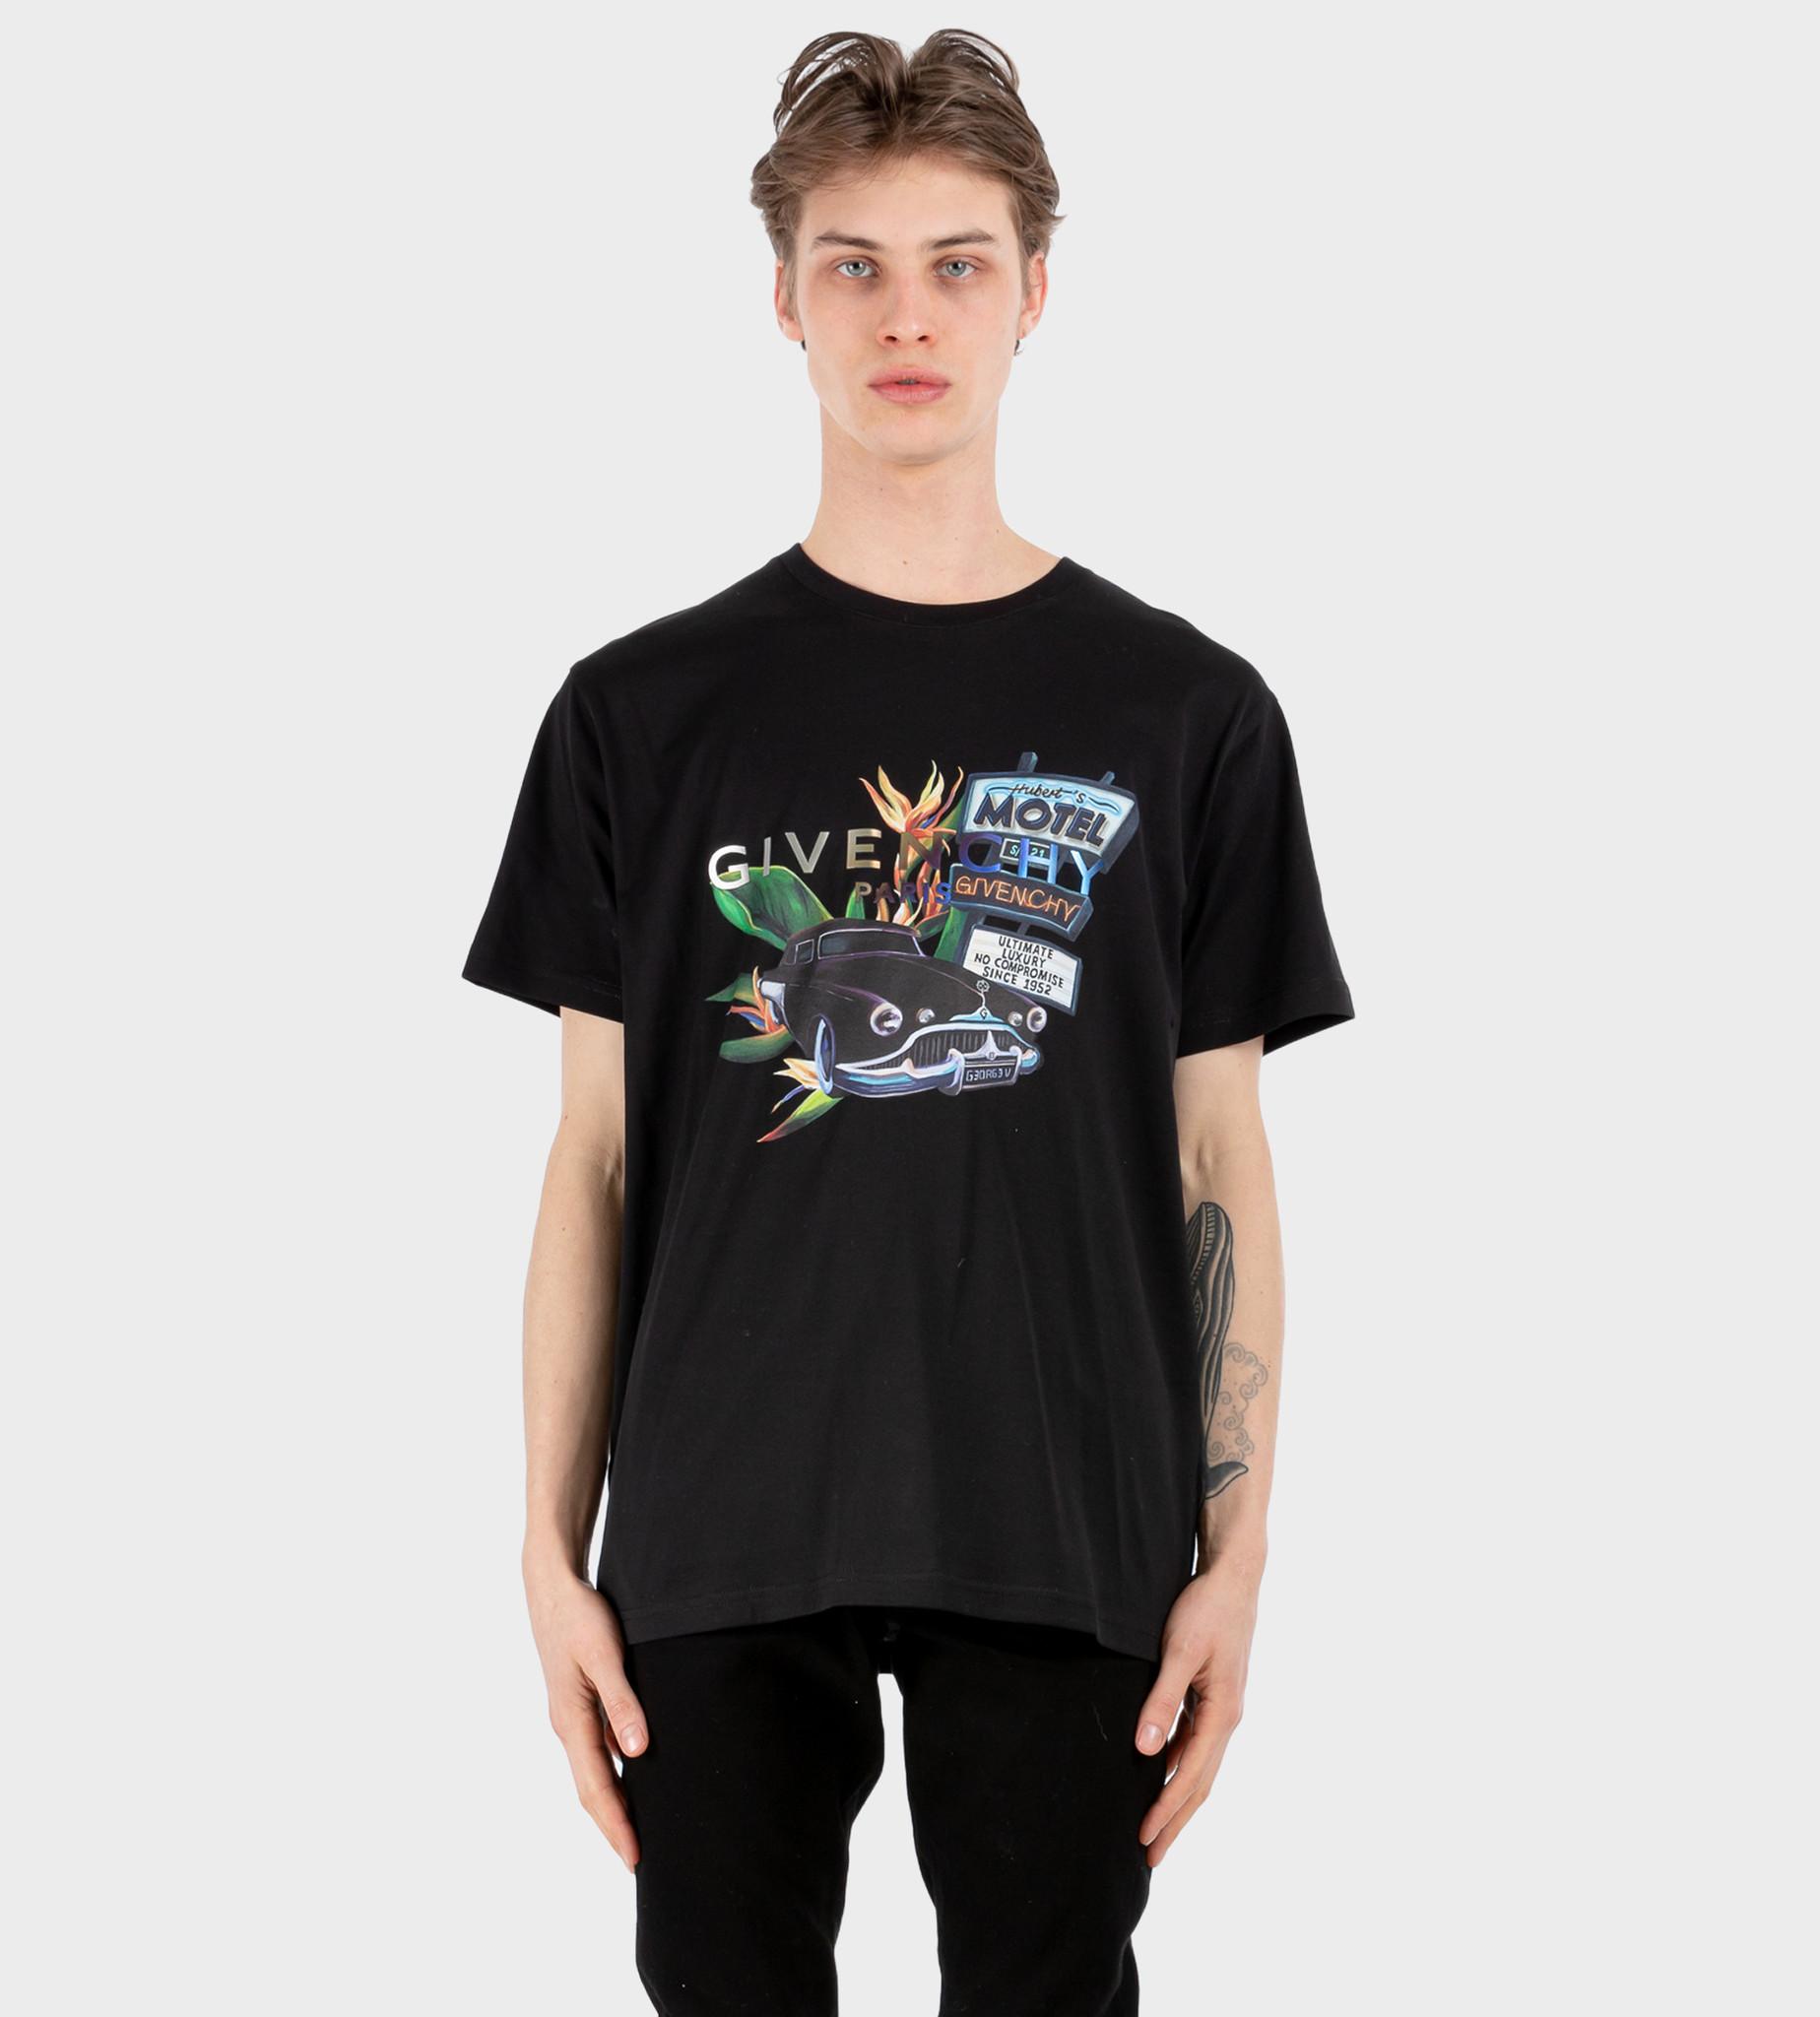 GIVENCHY Motel T-shirt Black